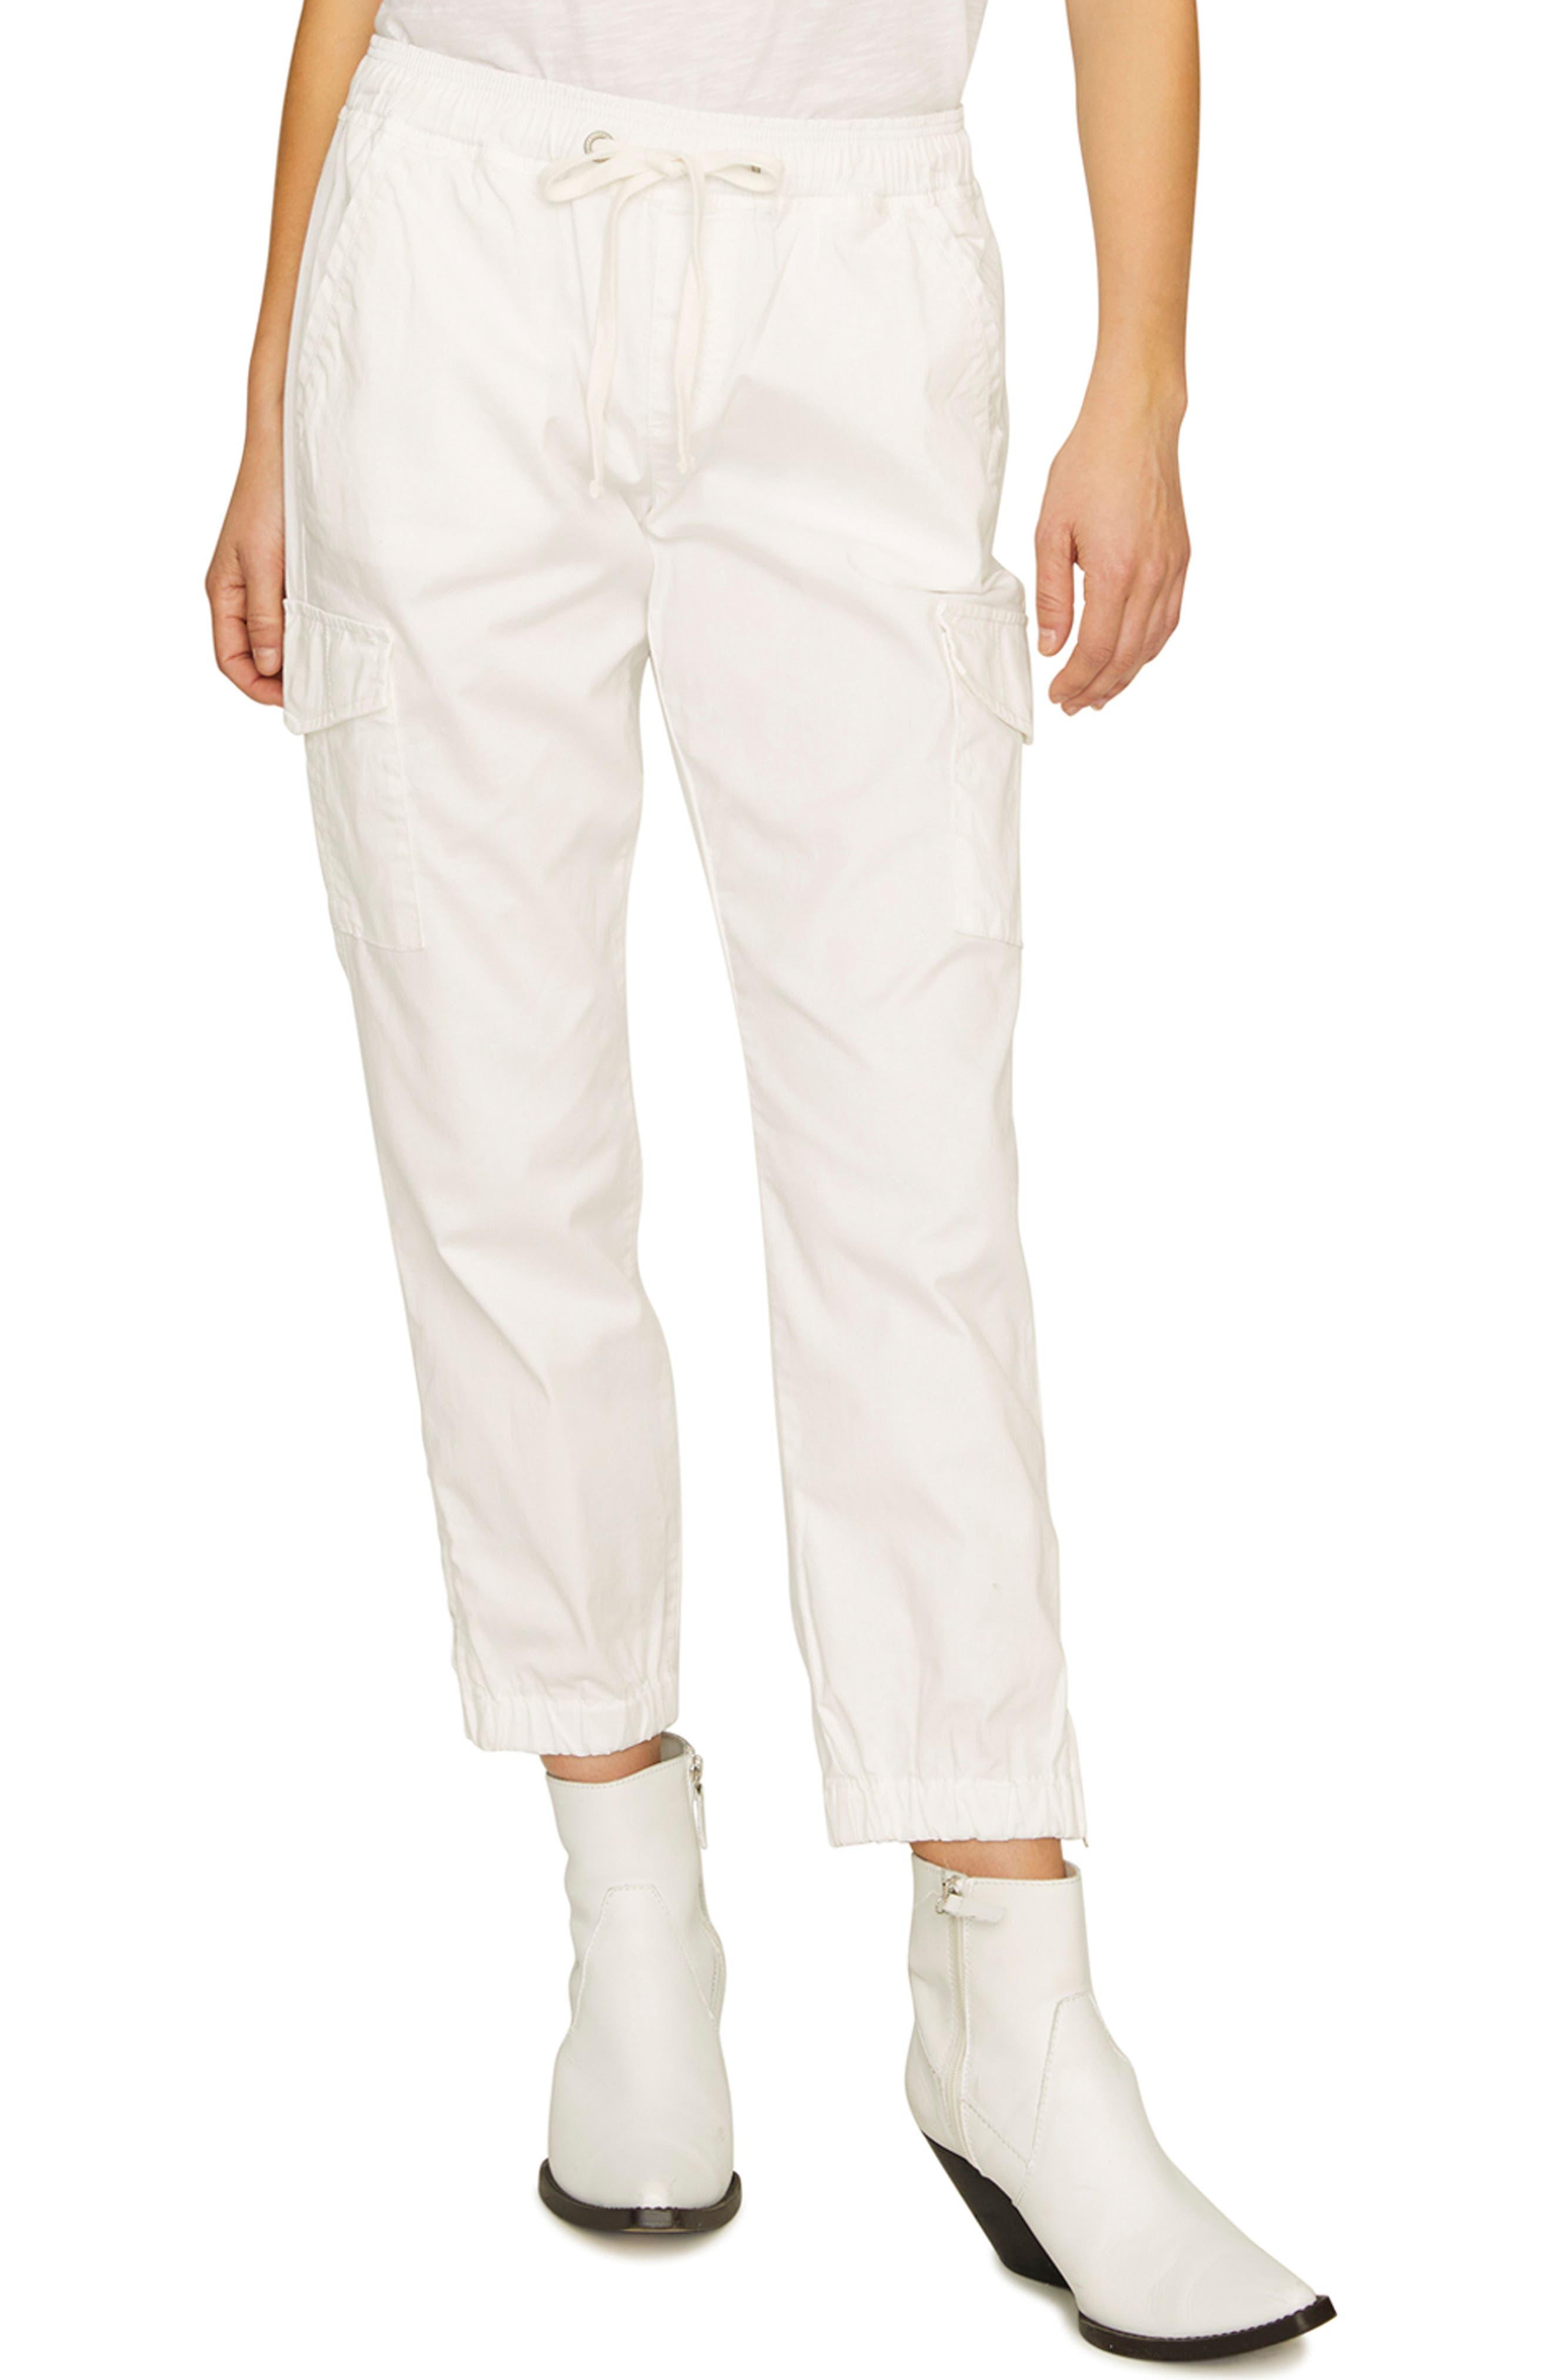 SANCTUARY, Drawstring Trooper Pants, Main thumbnail 1, color, BRITE WHITE